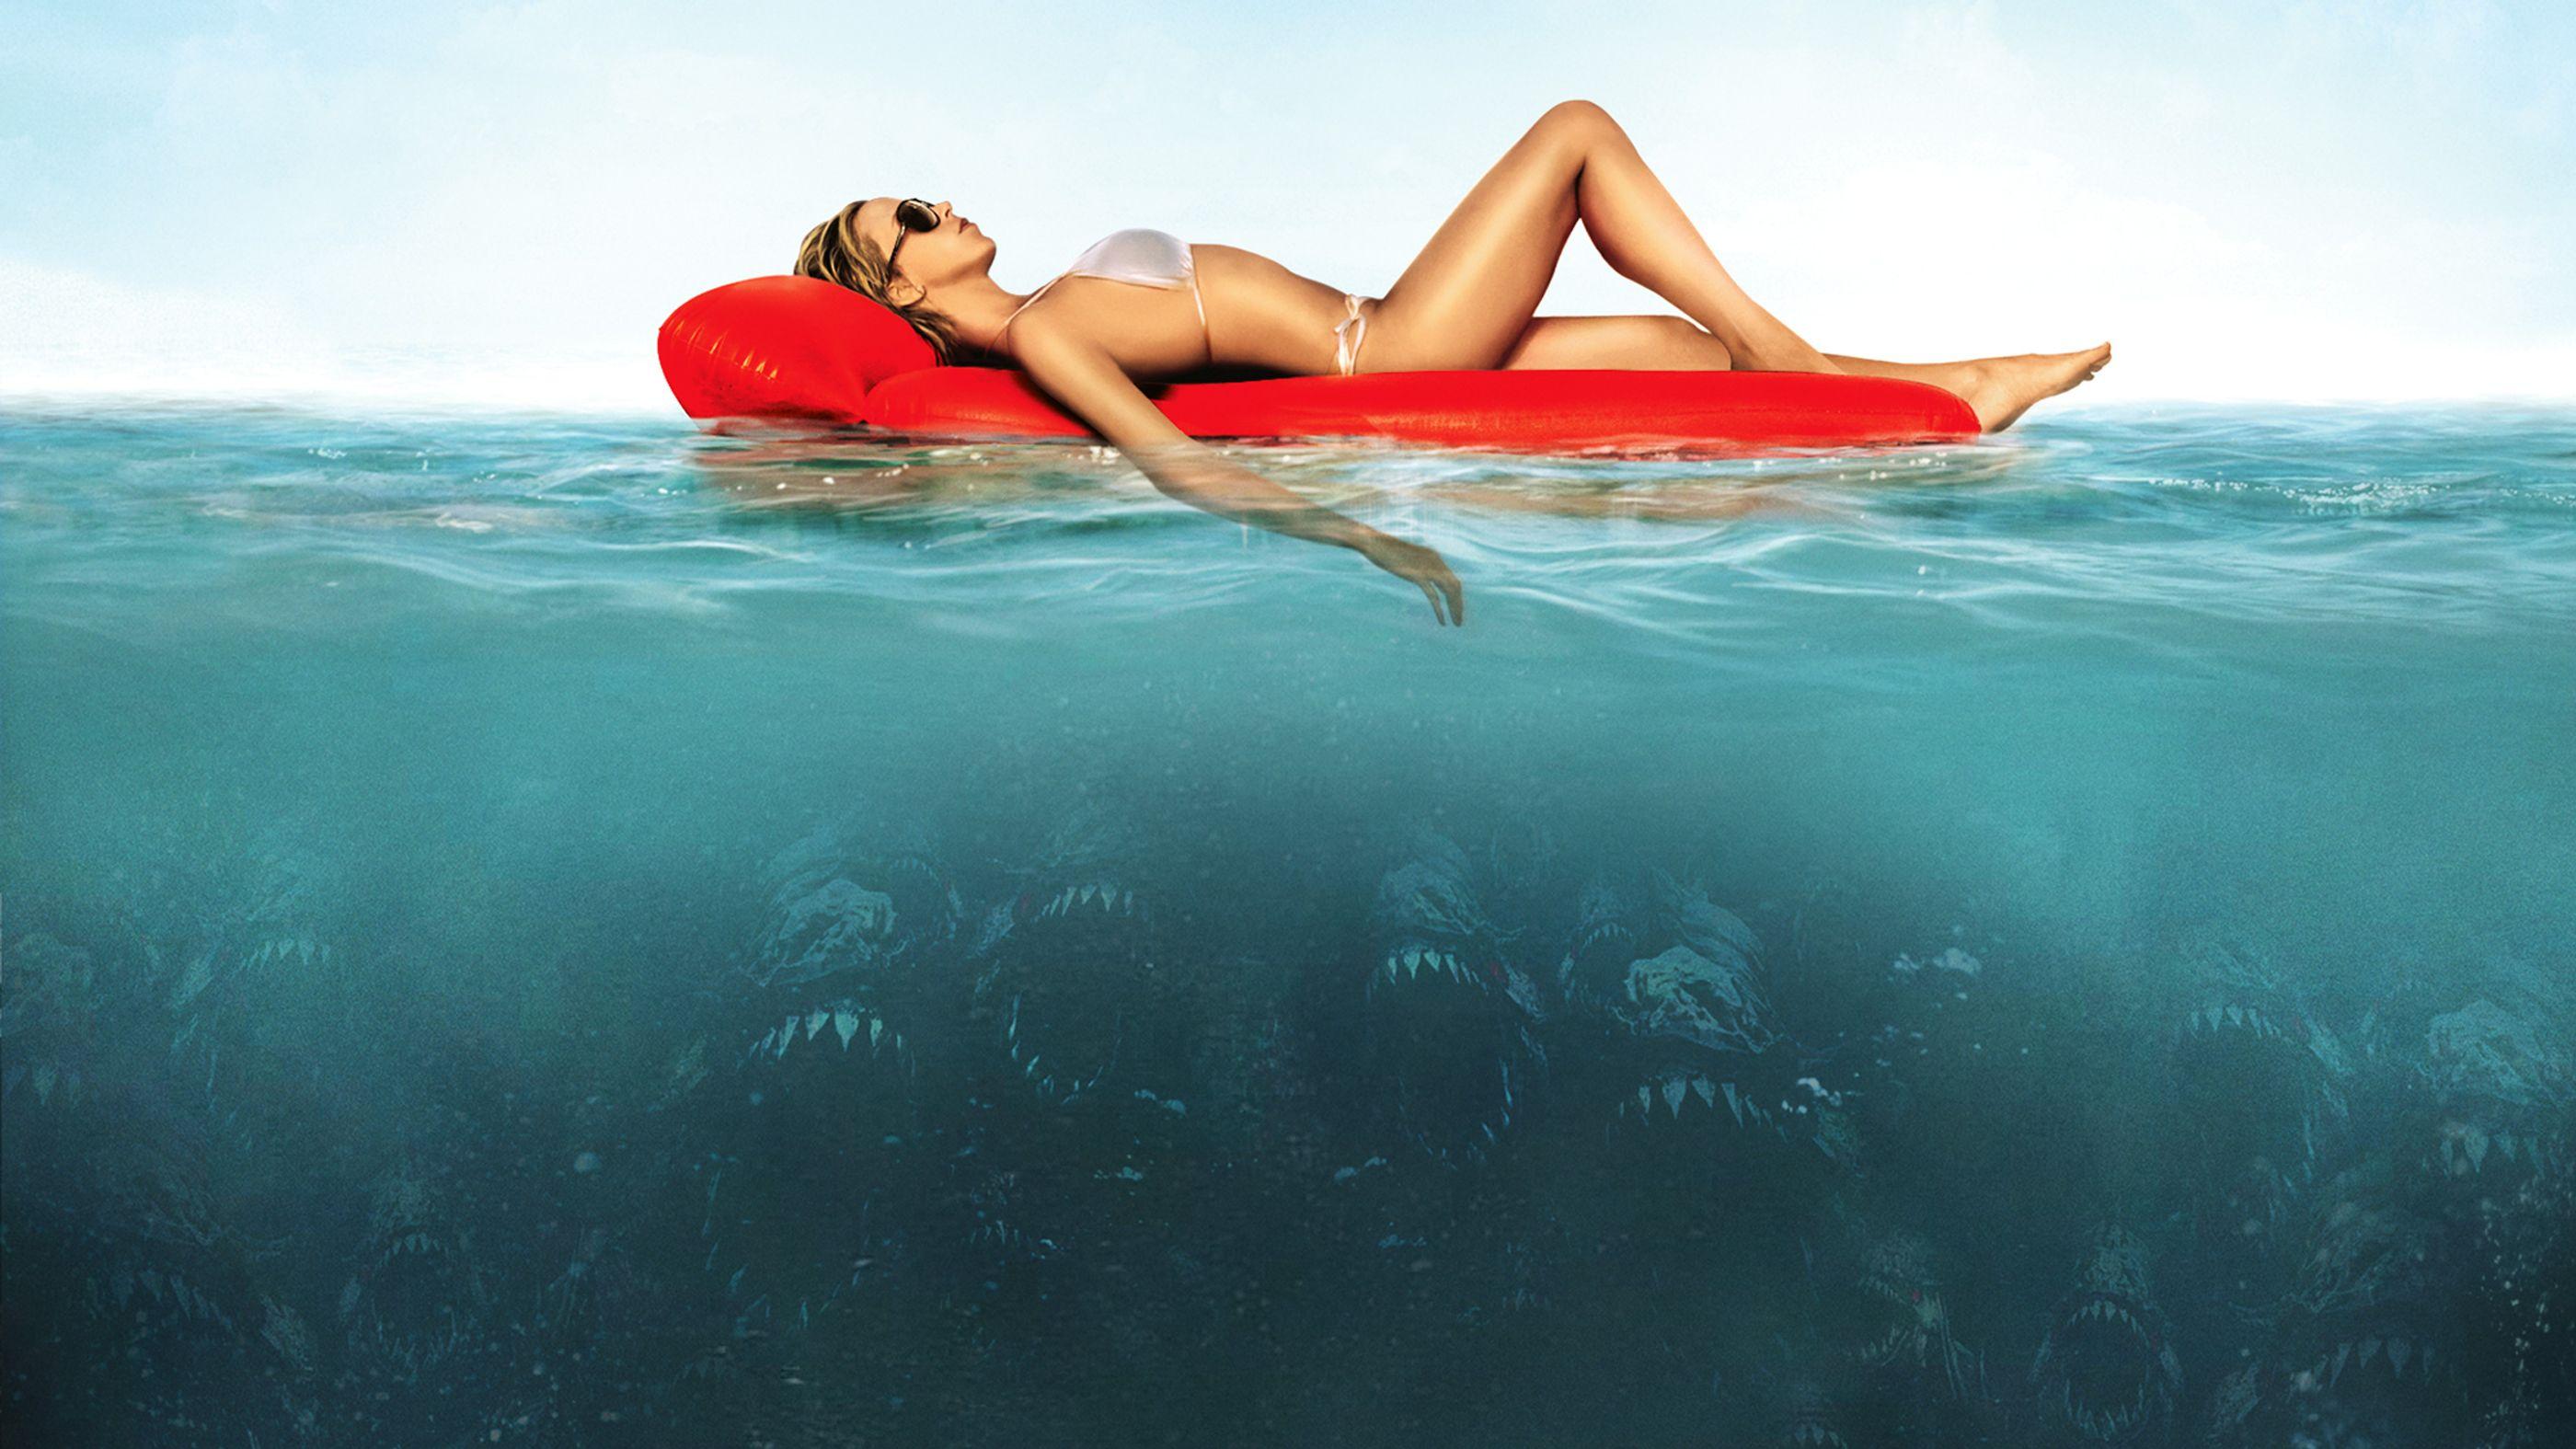 piranha 2010 movie download in hindi